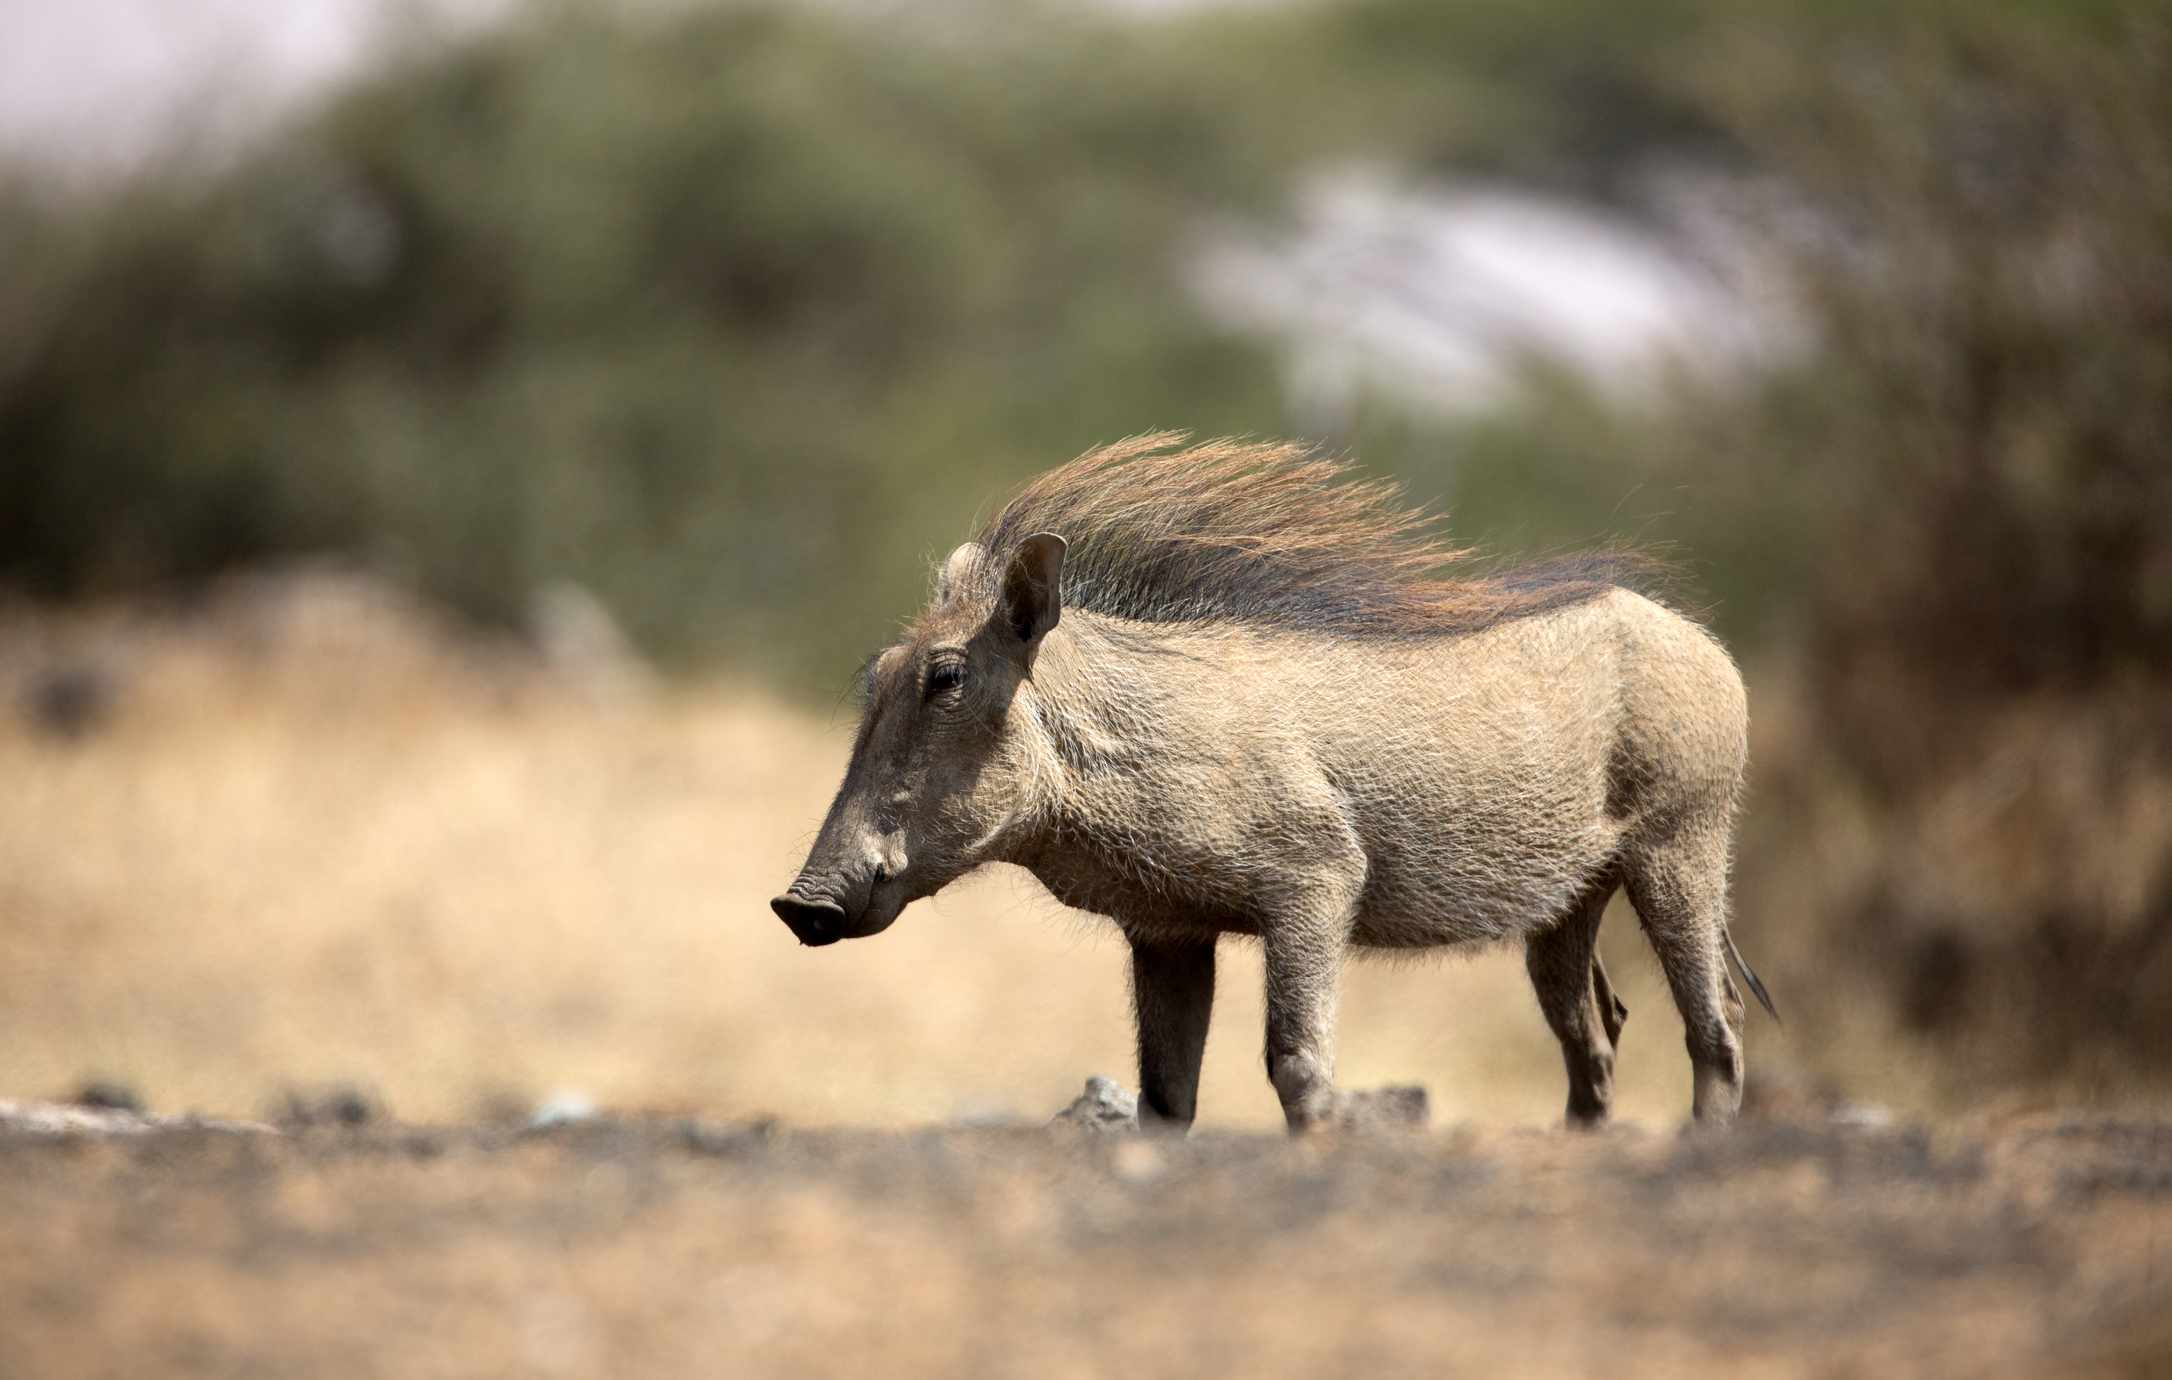 Profile of warthog with mane